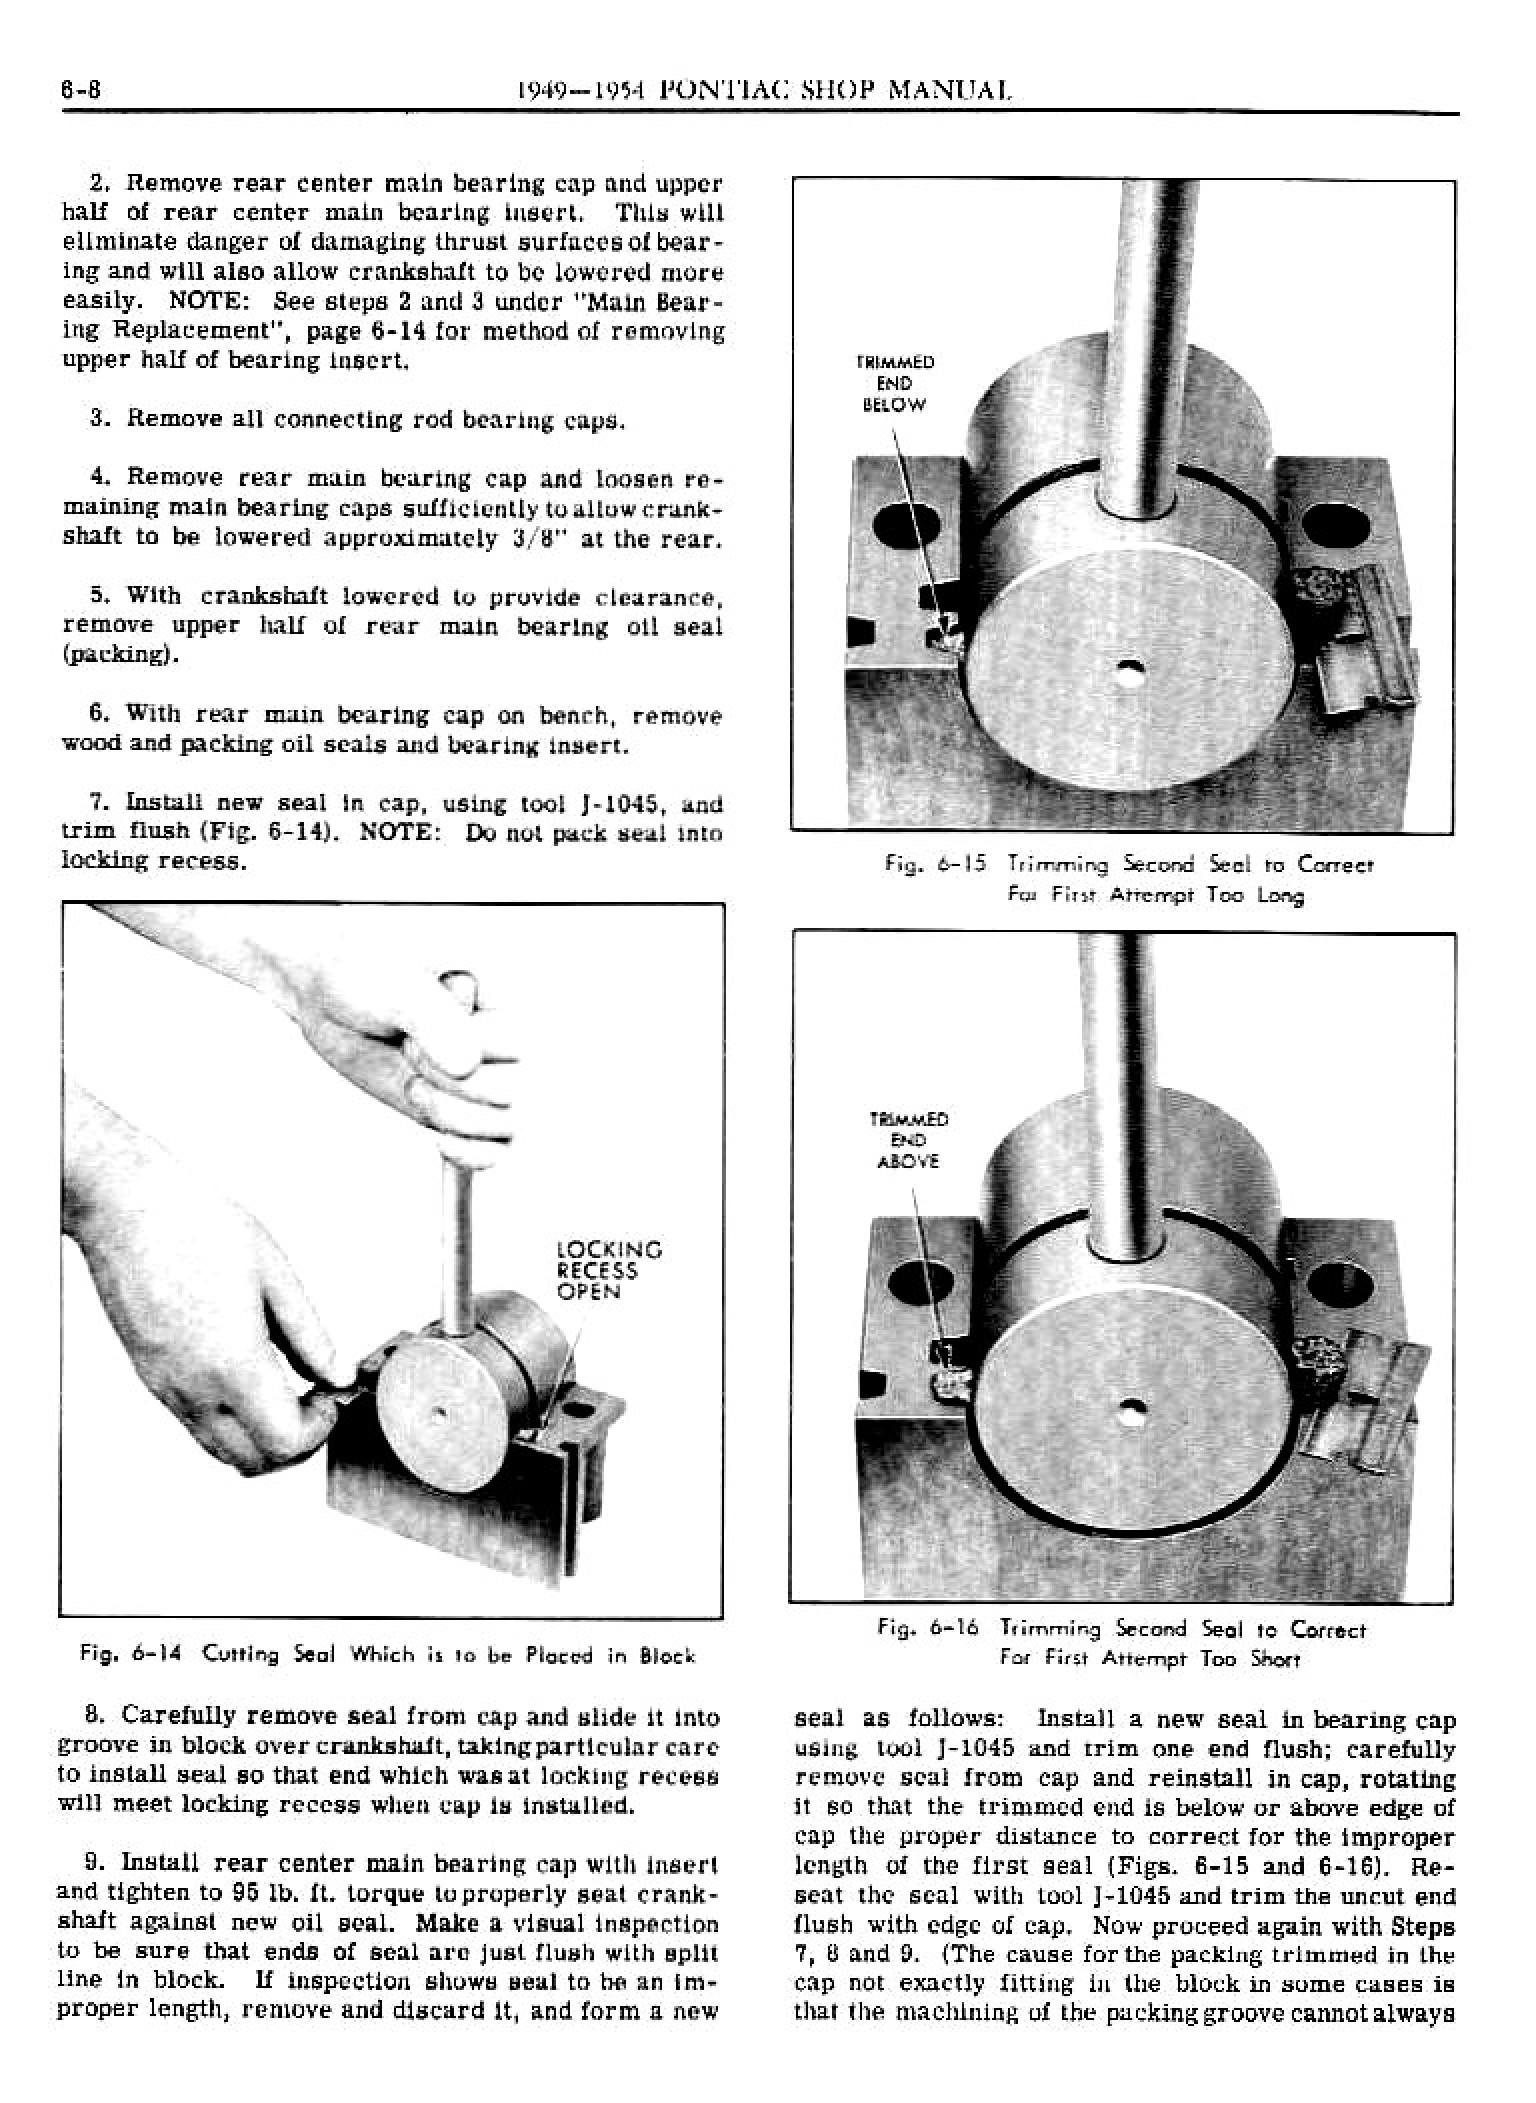 1949 Pontiac Shop Manual- Engine Mechanical Page 8 of 26